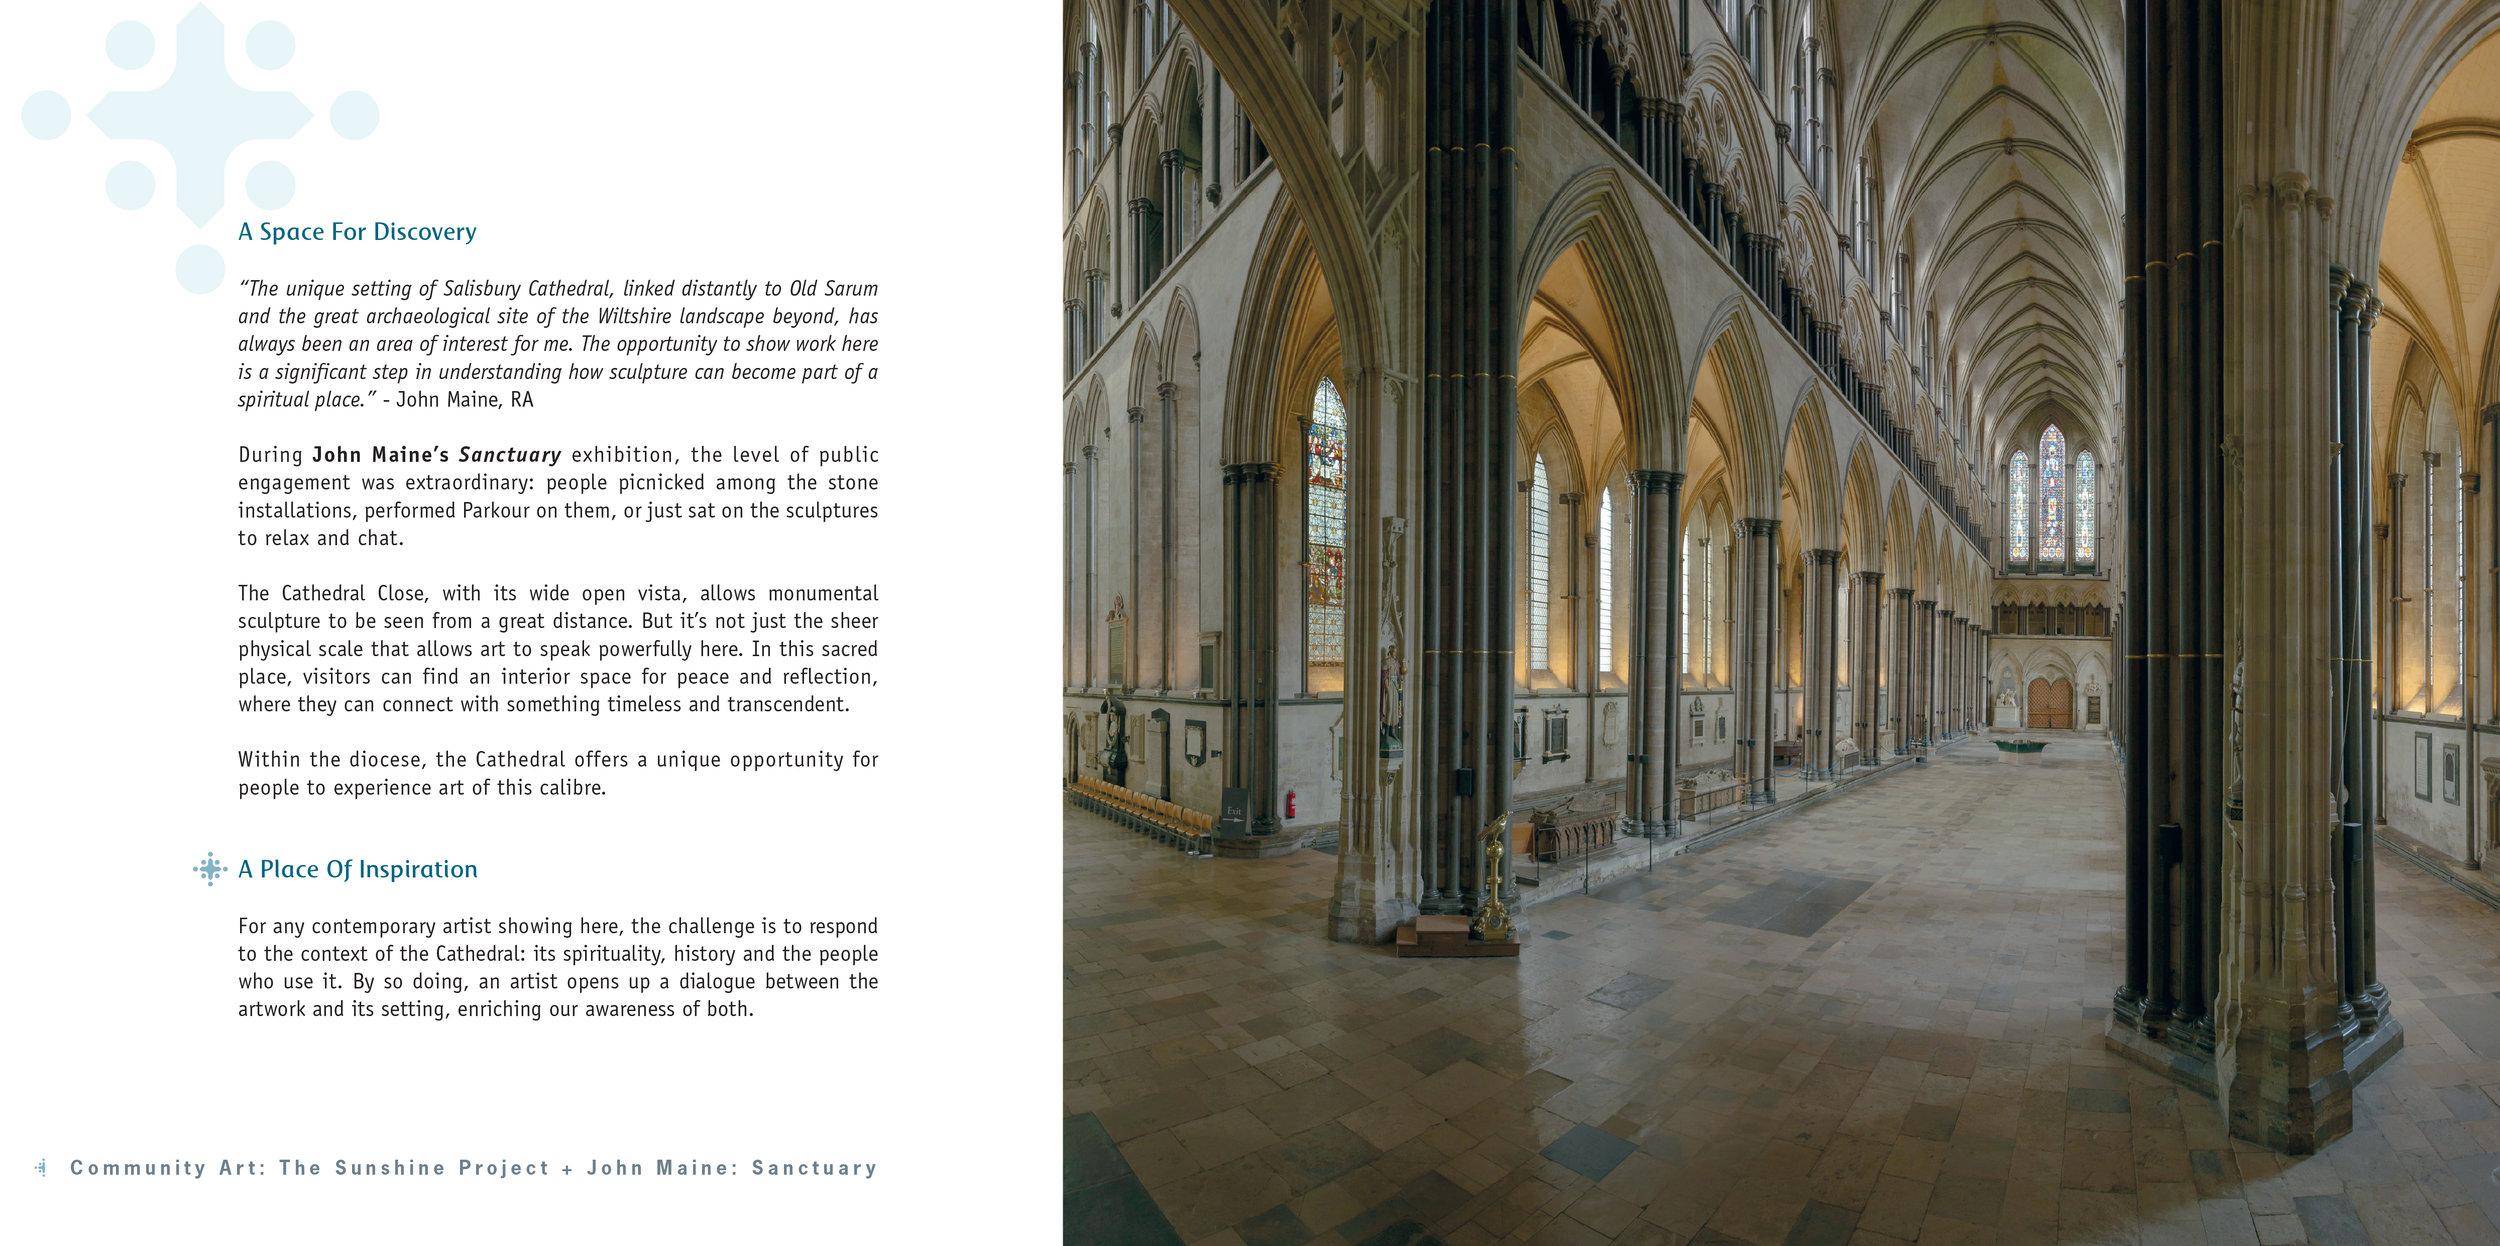 Salisbury-Art-spread4.jpg